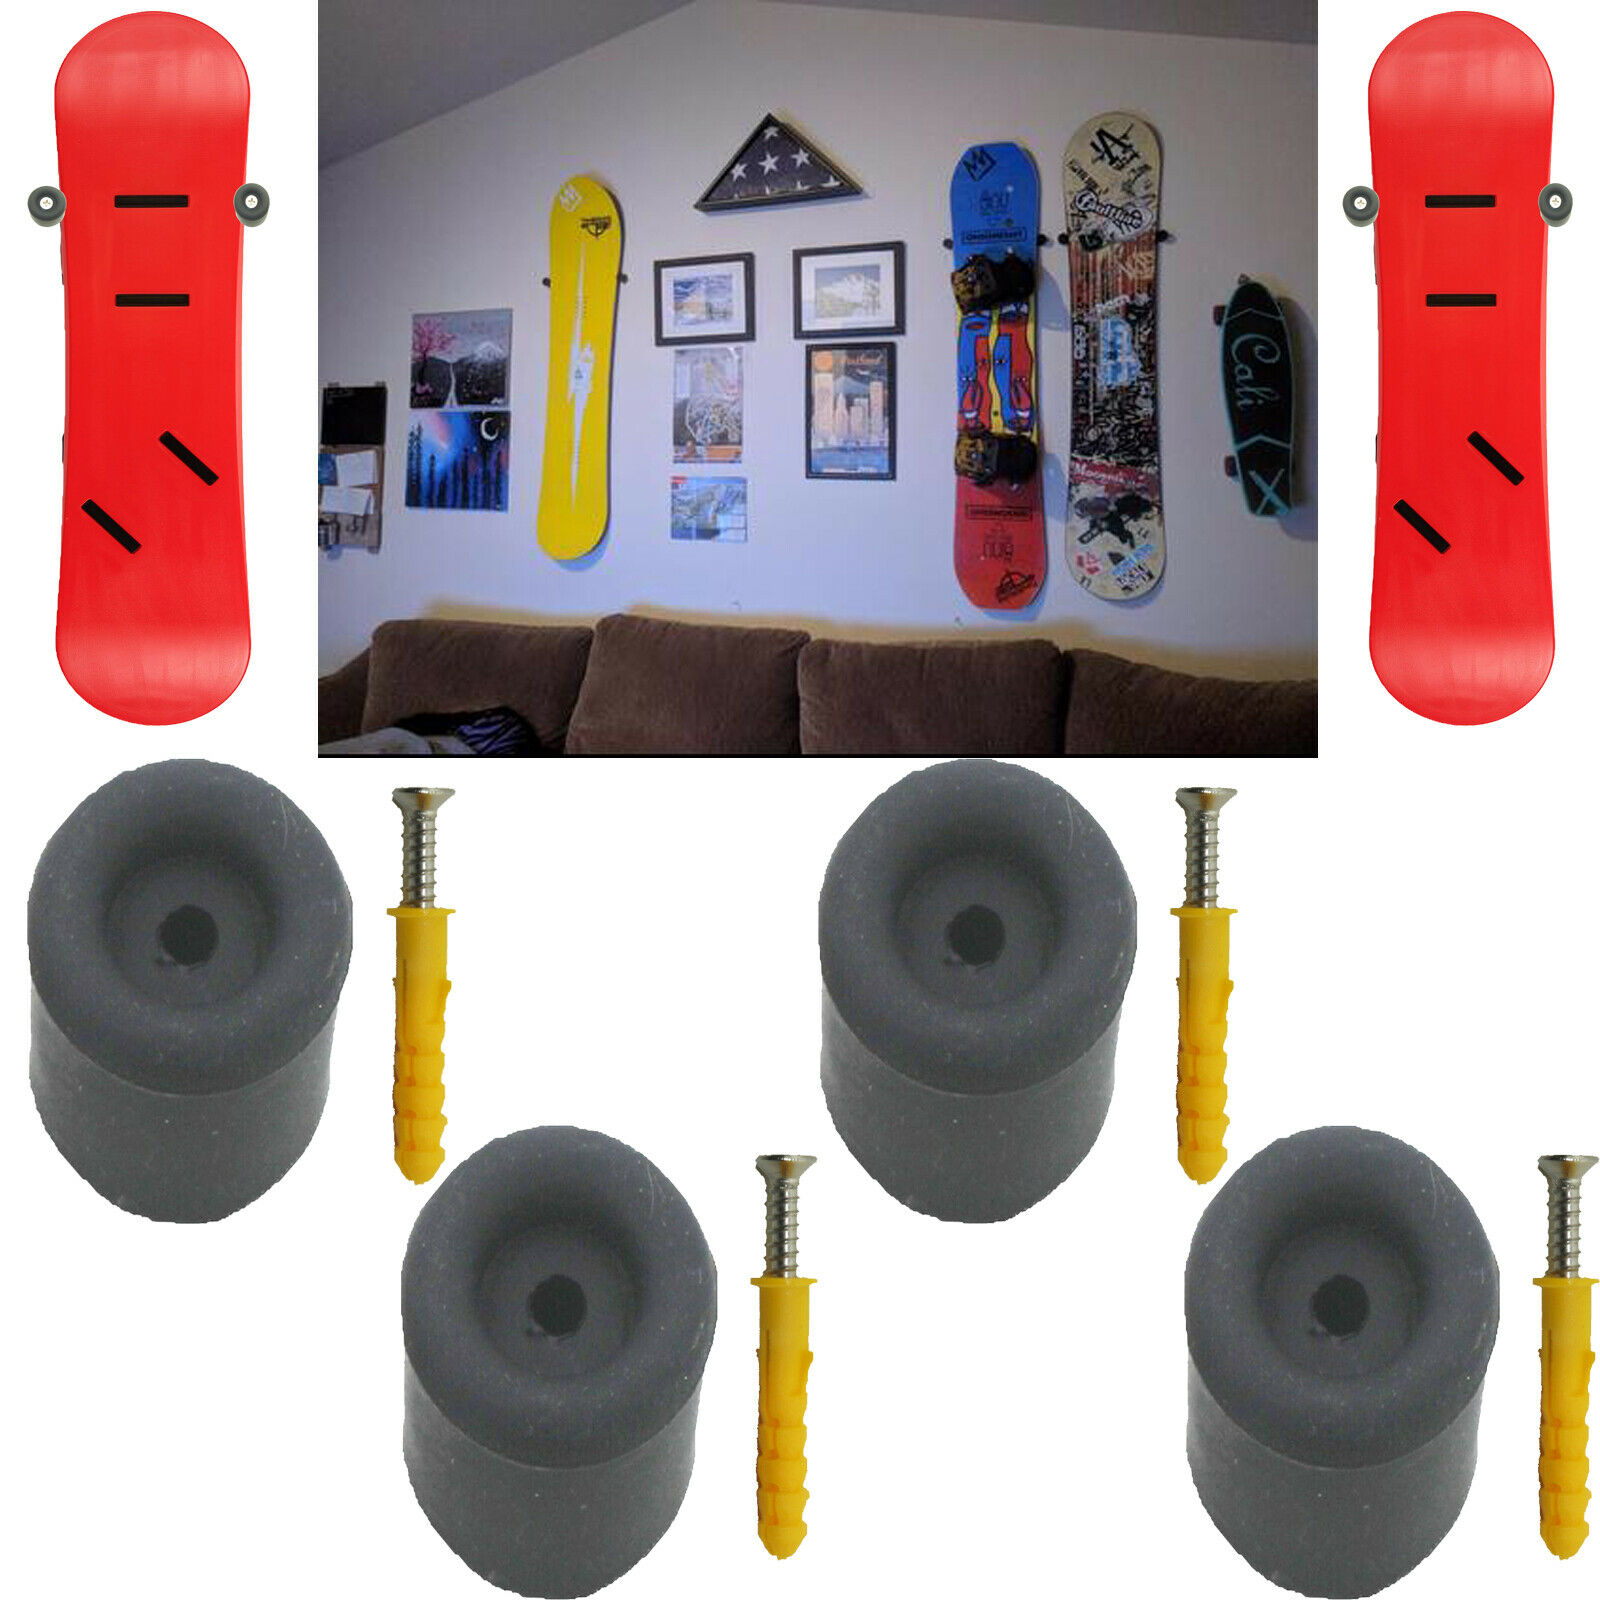 NEW Snowboard Hanger Skateboard Holder Longboard Display Storage Rack Wall Mount